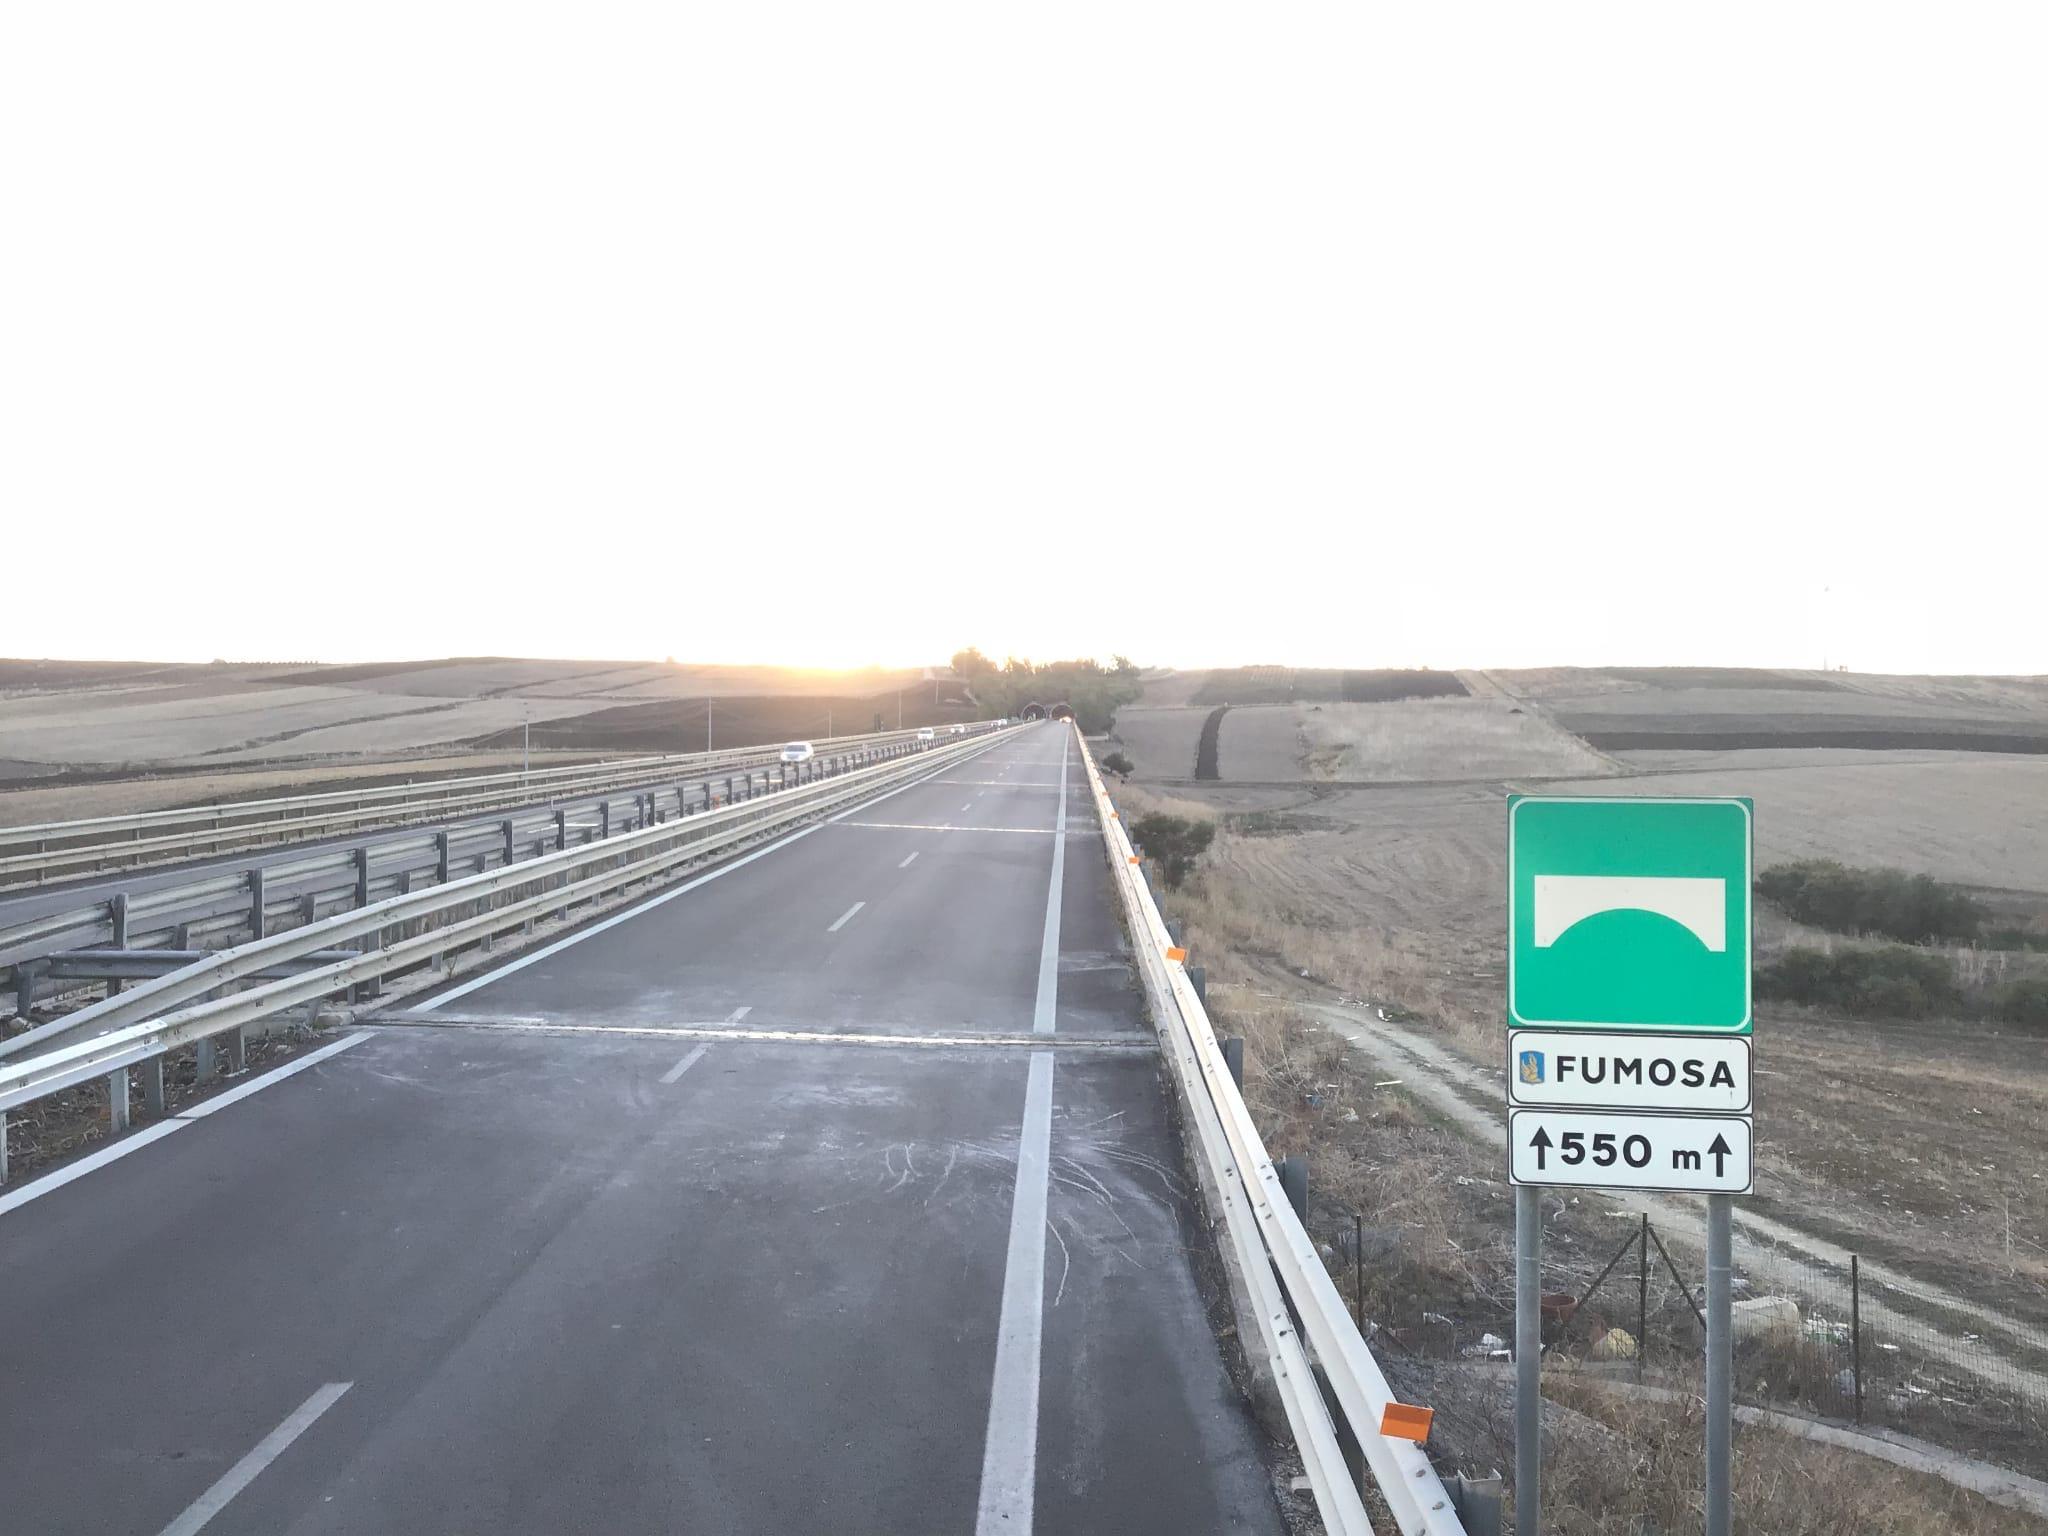 Viadotto Fumosa